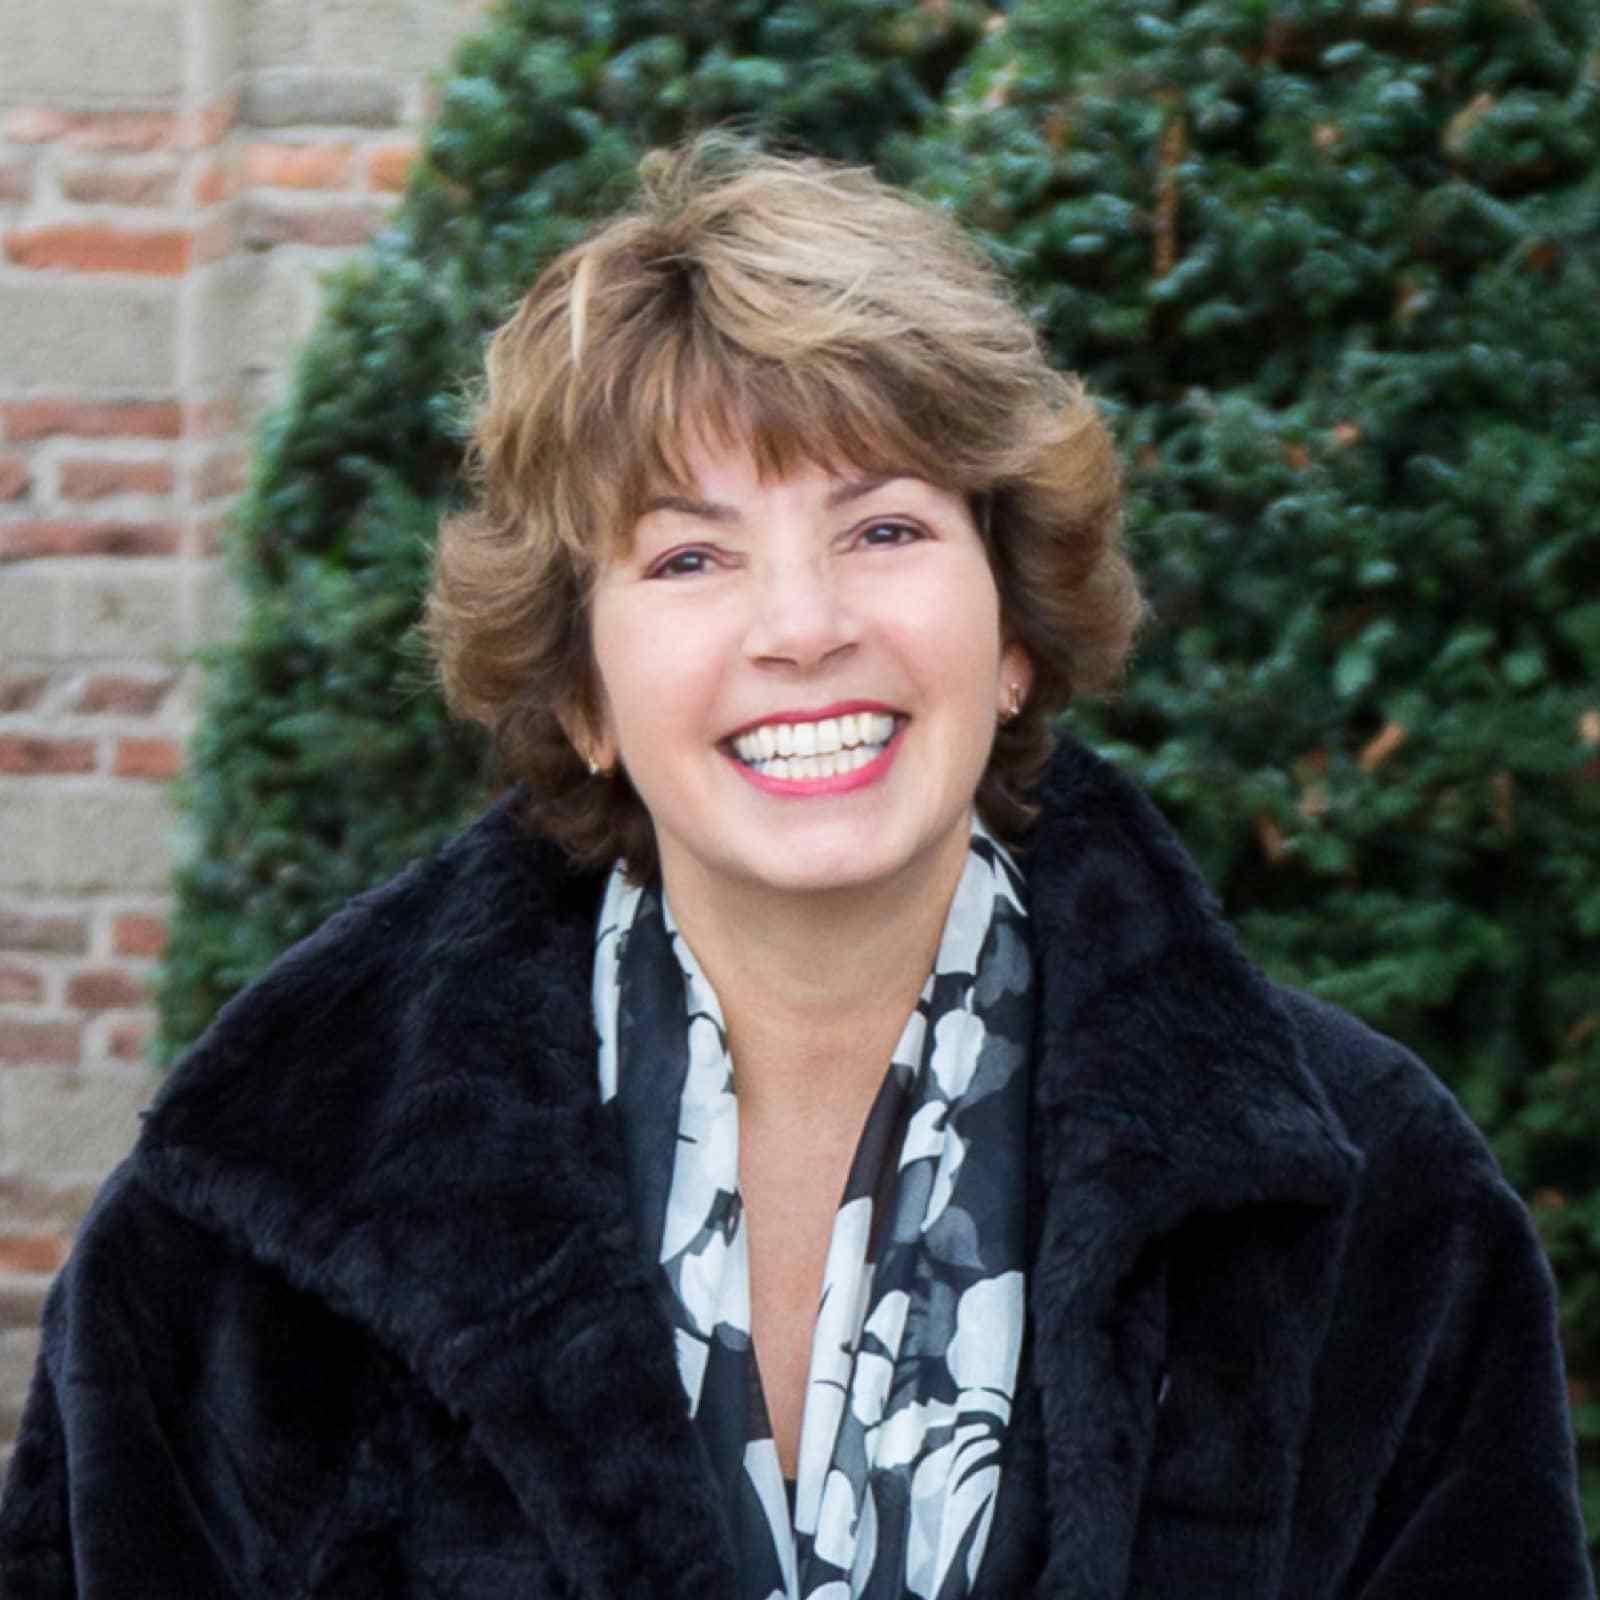 Hanneke Boom - Boekhouder en adviseur in Vleuten